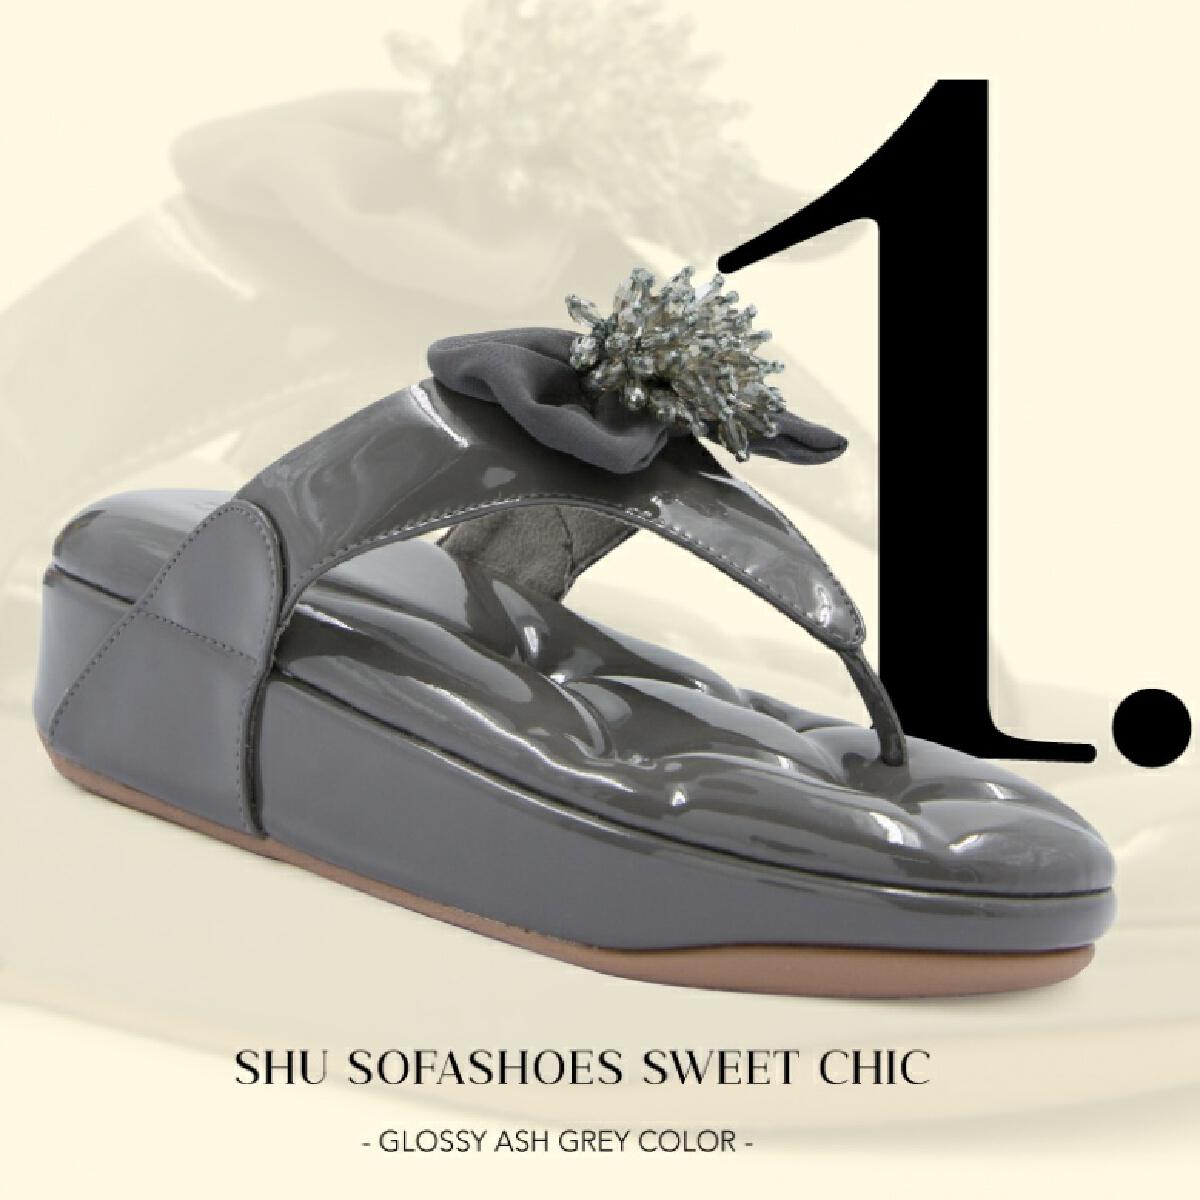 SHU รองเท้า 5 อันดับ ฮอตฮิต ขายดีที่สุดแห่งปี